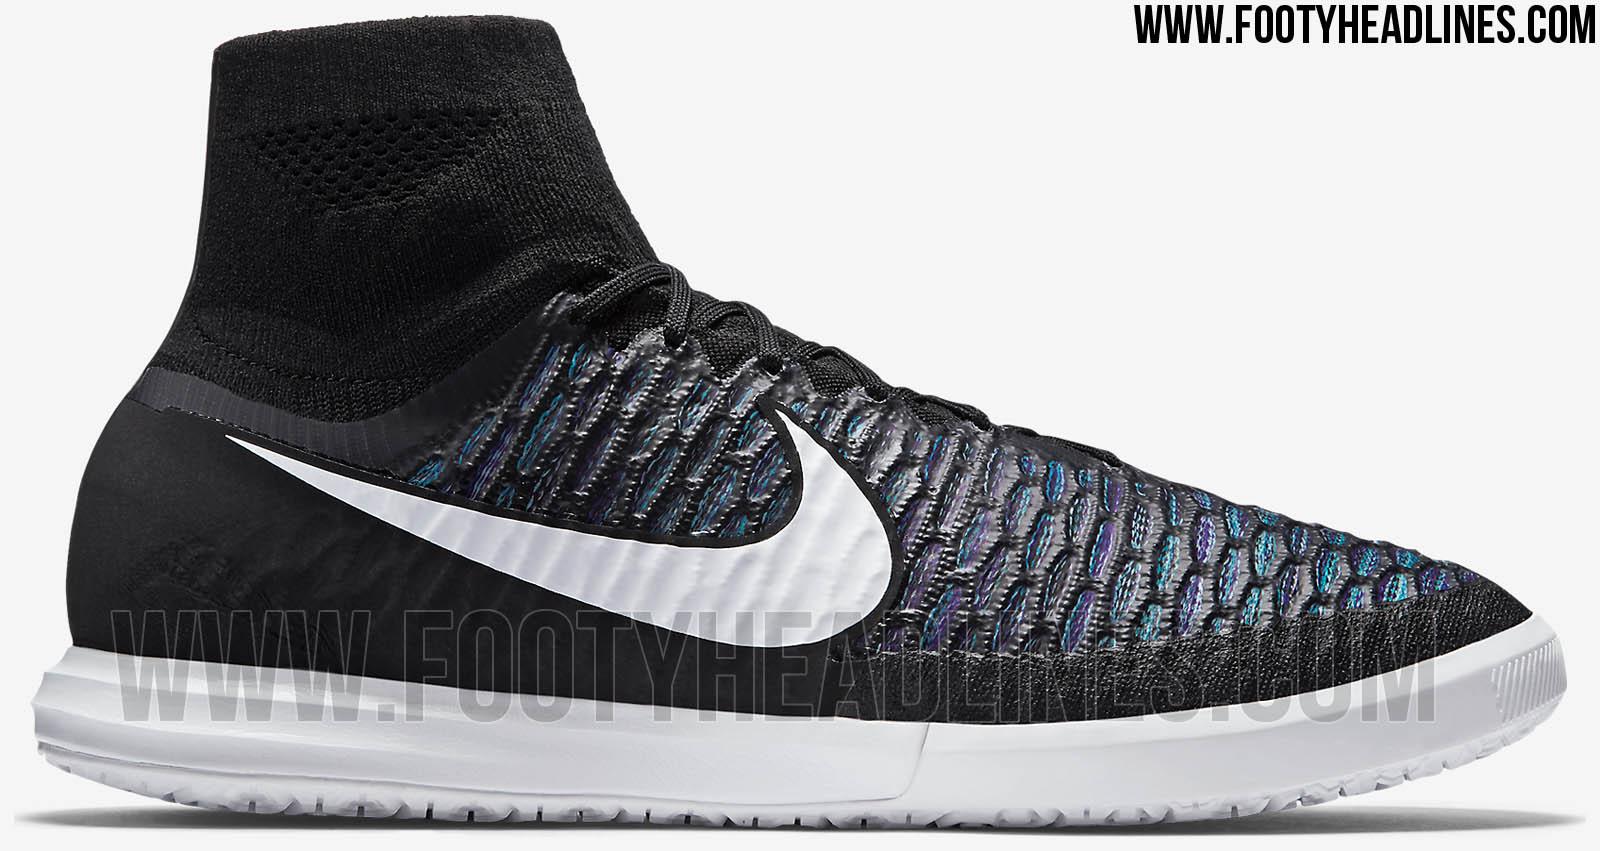 Nike Rubber Toe Shoes